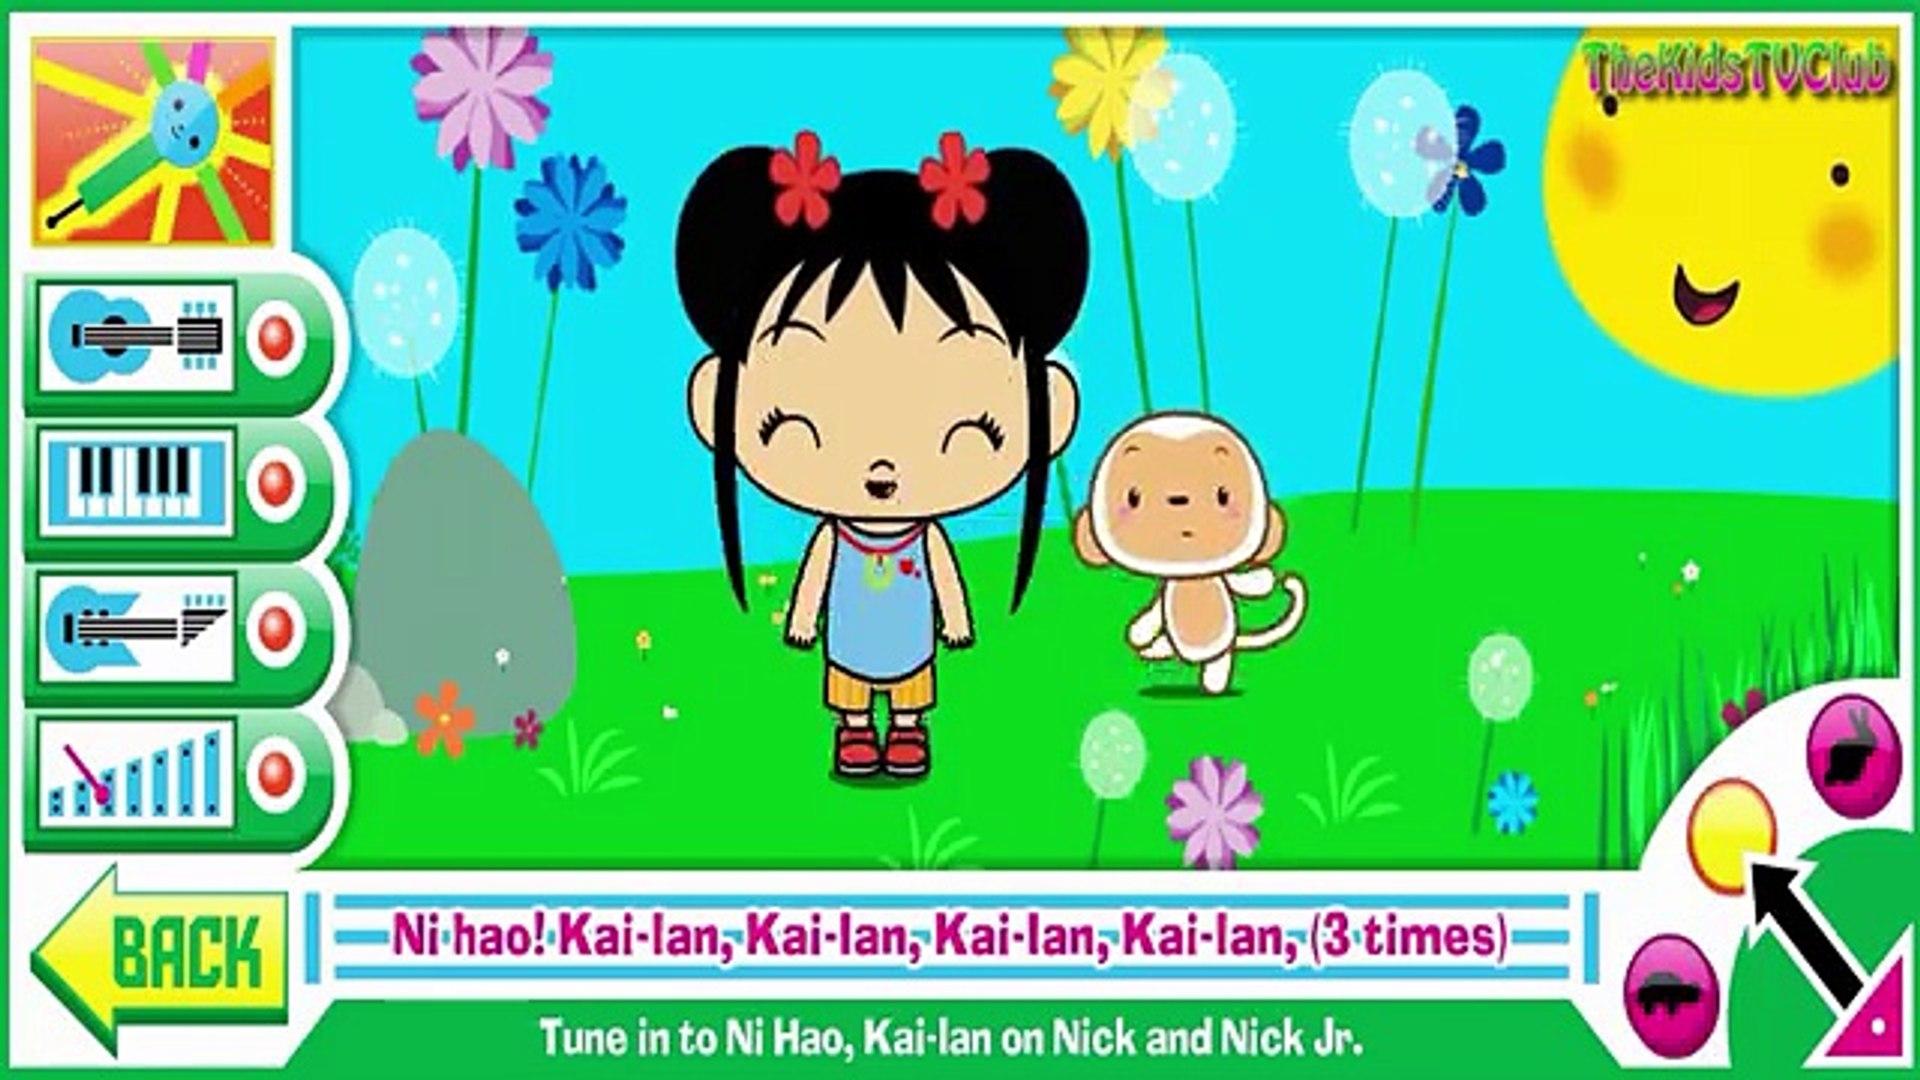 И б б б б б б танцы Дора свежий игра мега музыка п п п пение команда с 3d umizoomi hao kai-lan